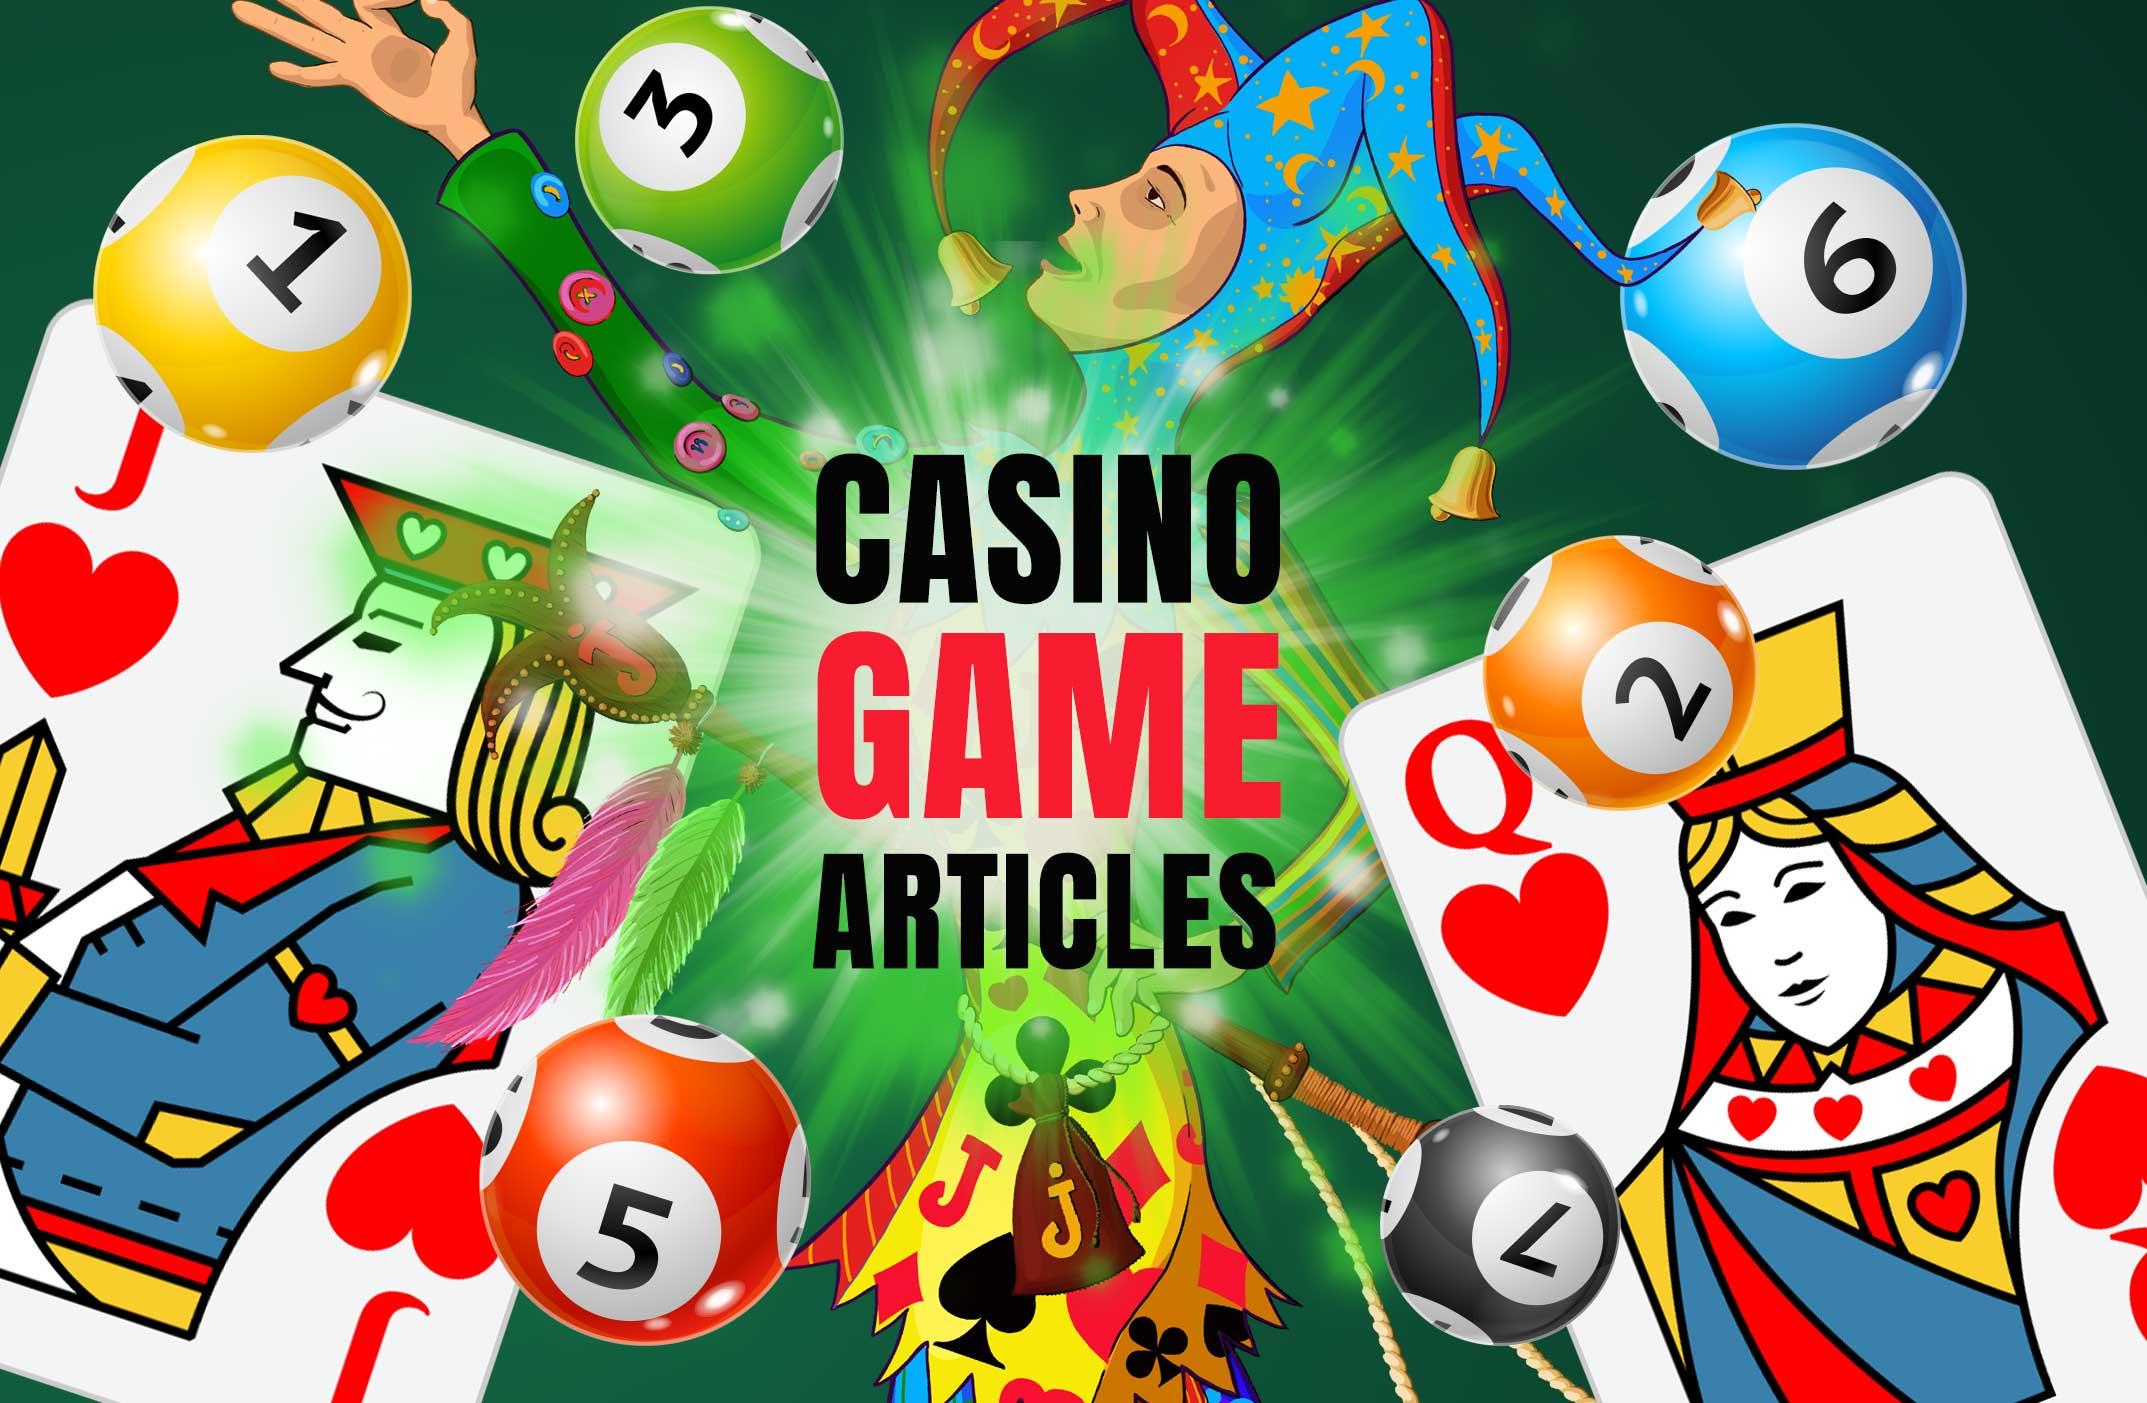 Casino Game Articles - Online Casino Canada, Bonuses, Real Money